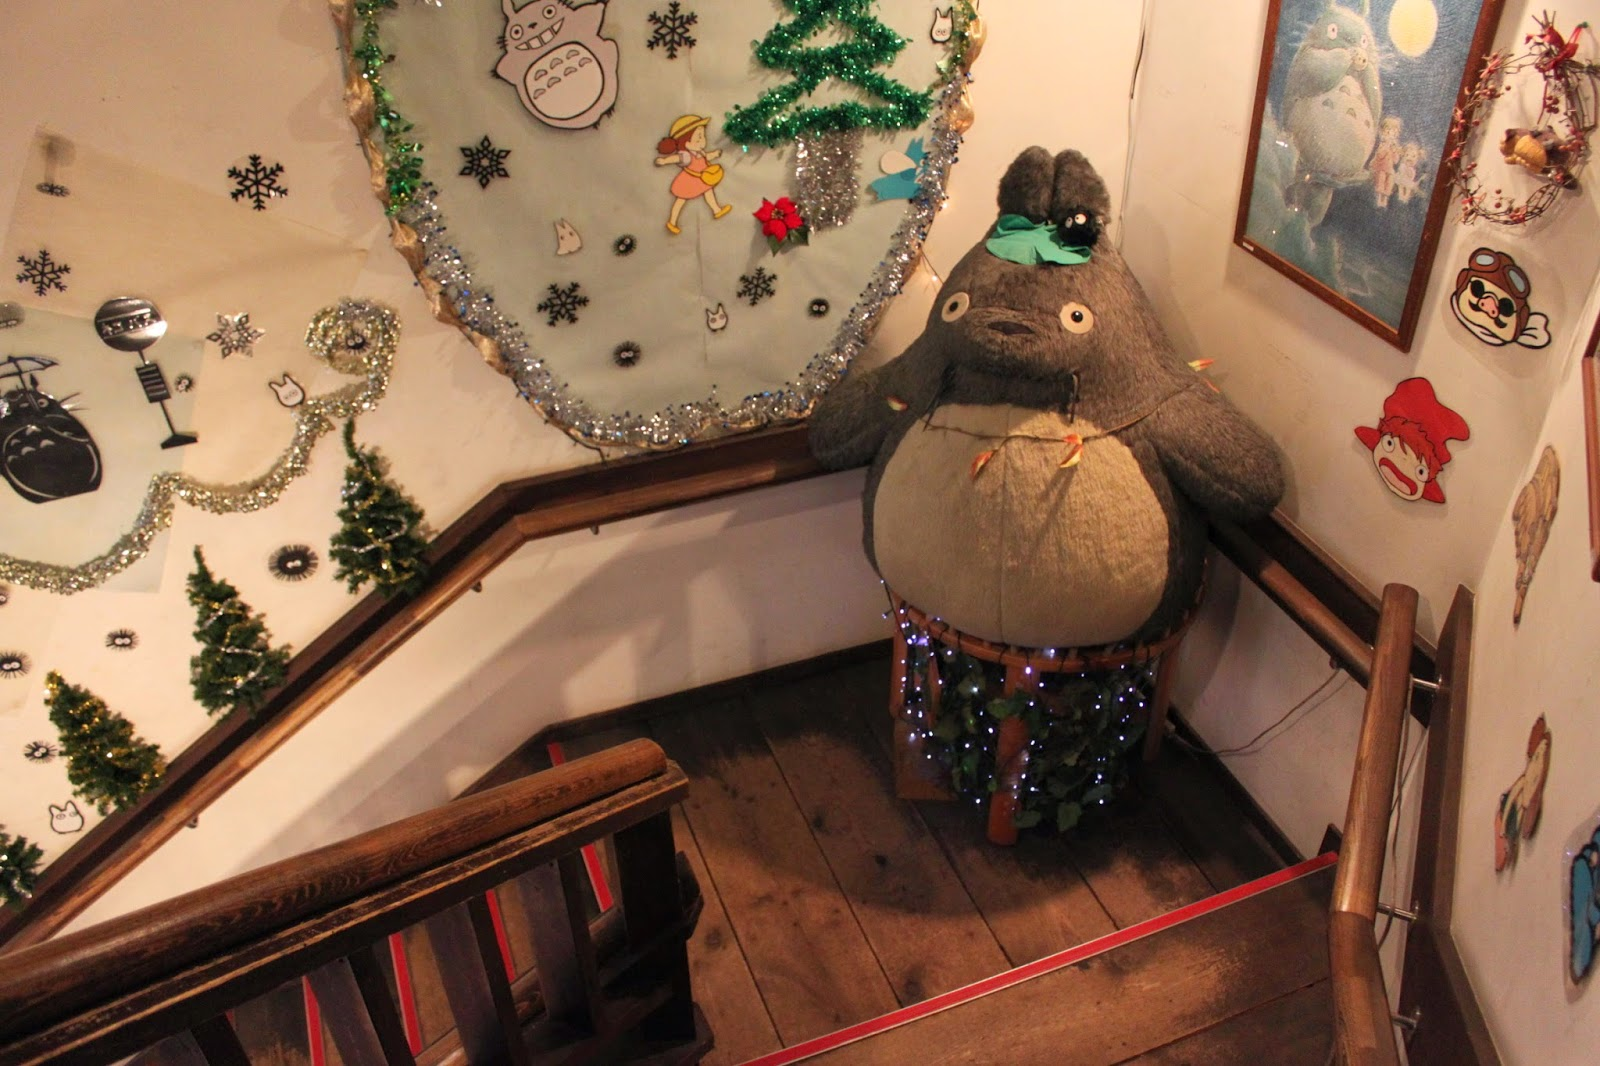 Otaru Yume no Oto Character House Totoro